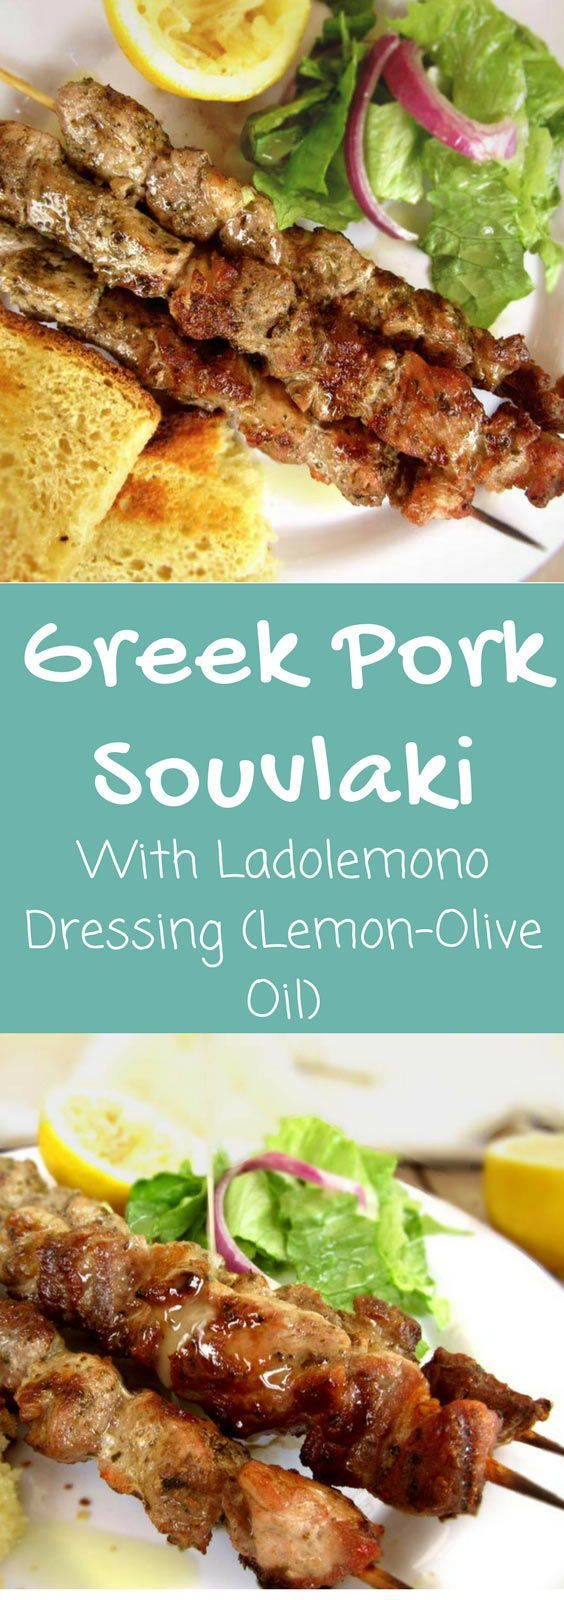 Recipe for making Authentic Greek Souvlaki (Pork Skewers).